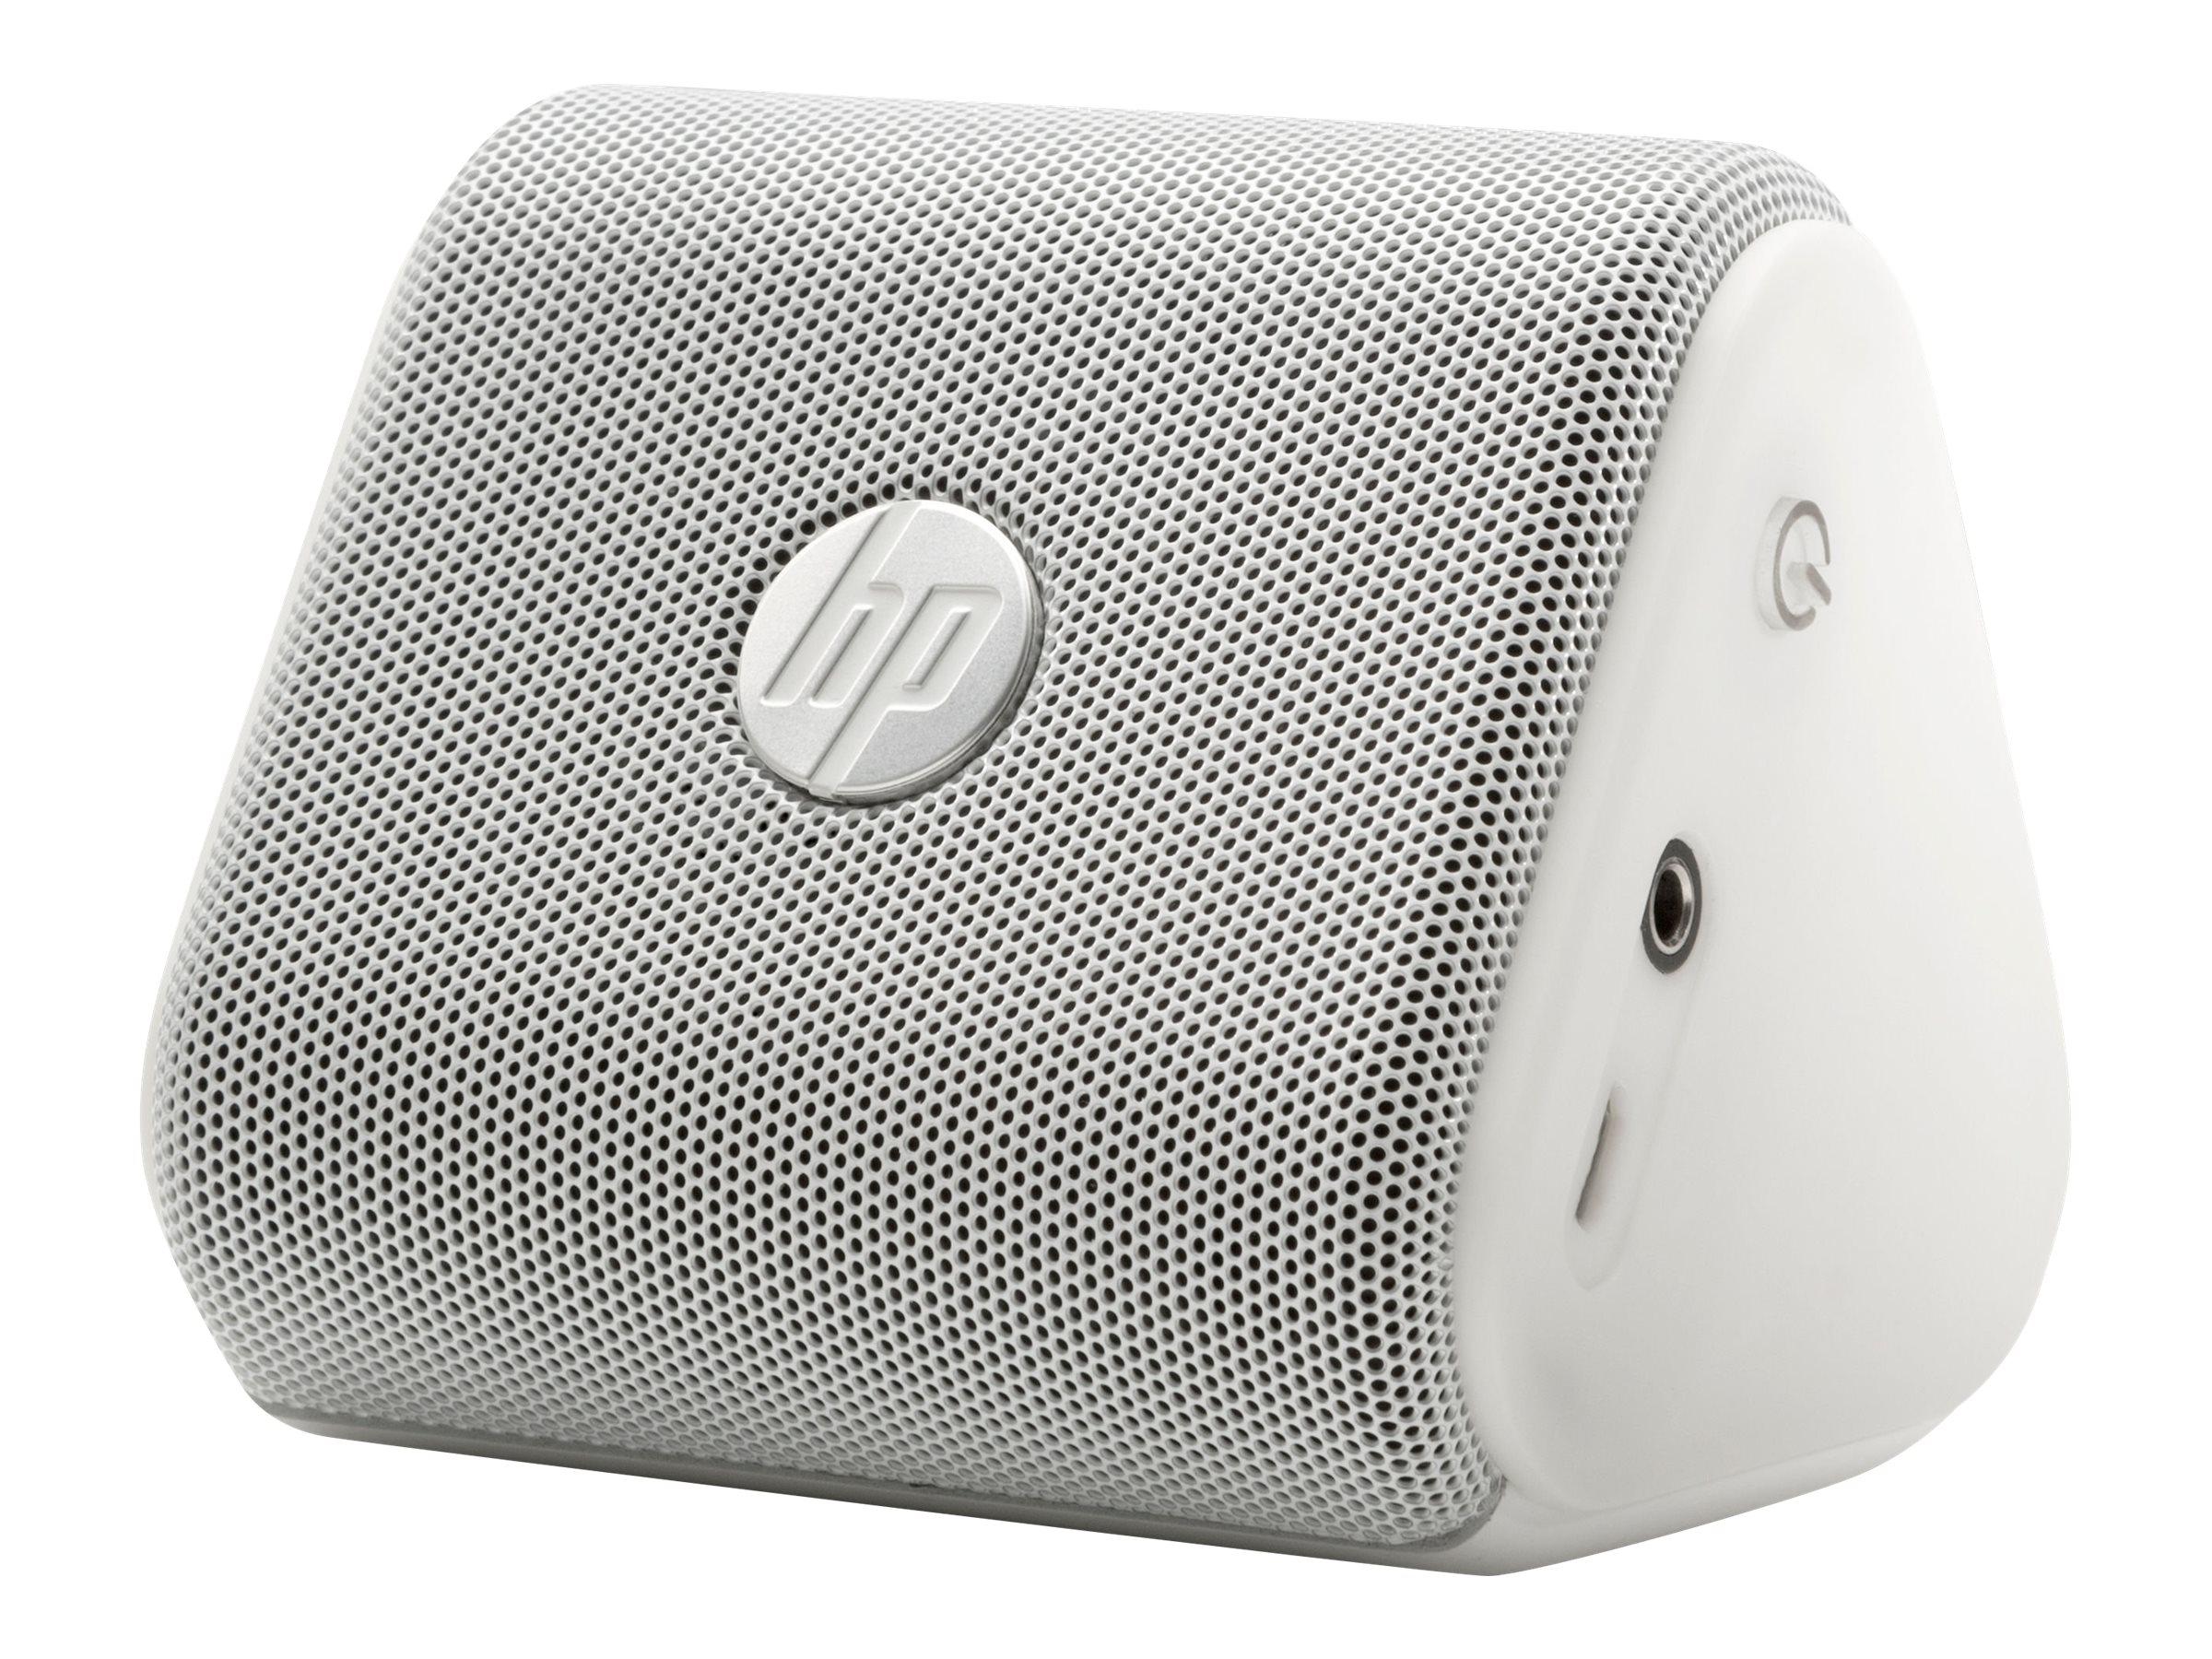 HP Roar Mini Wireless Speaker - Lautsprecher - tragbar - kabellos - Bluetooth - 2.5 Watt